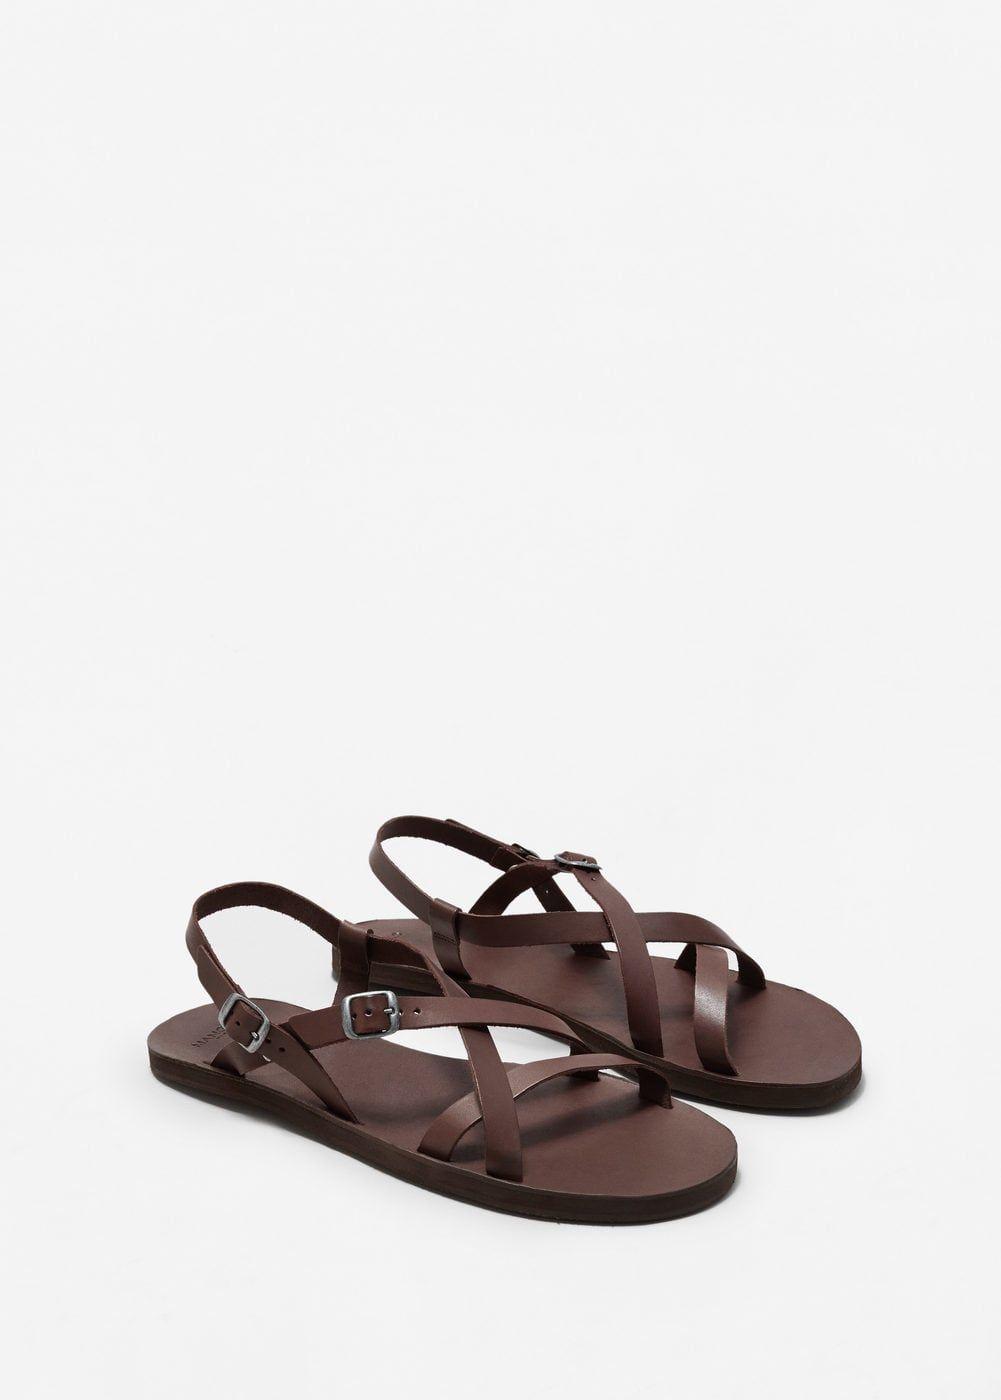 Sandalia piel tiras | MANGO MAN